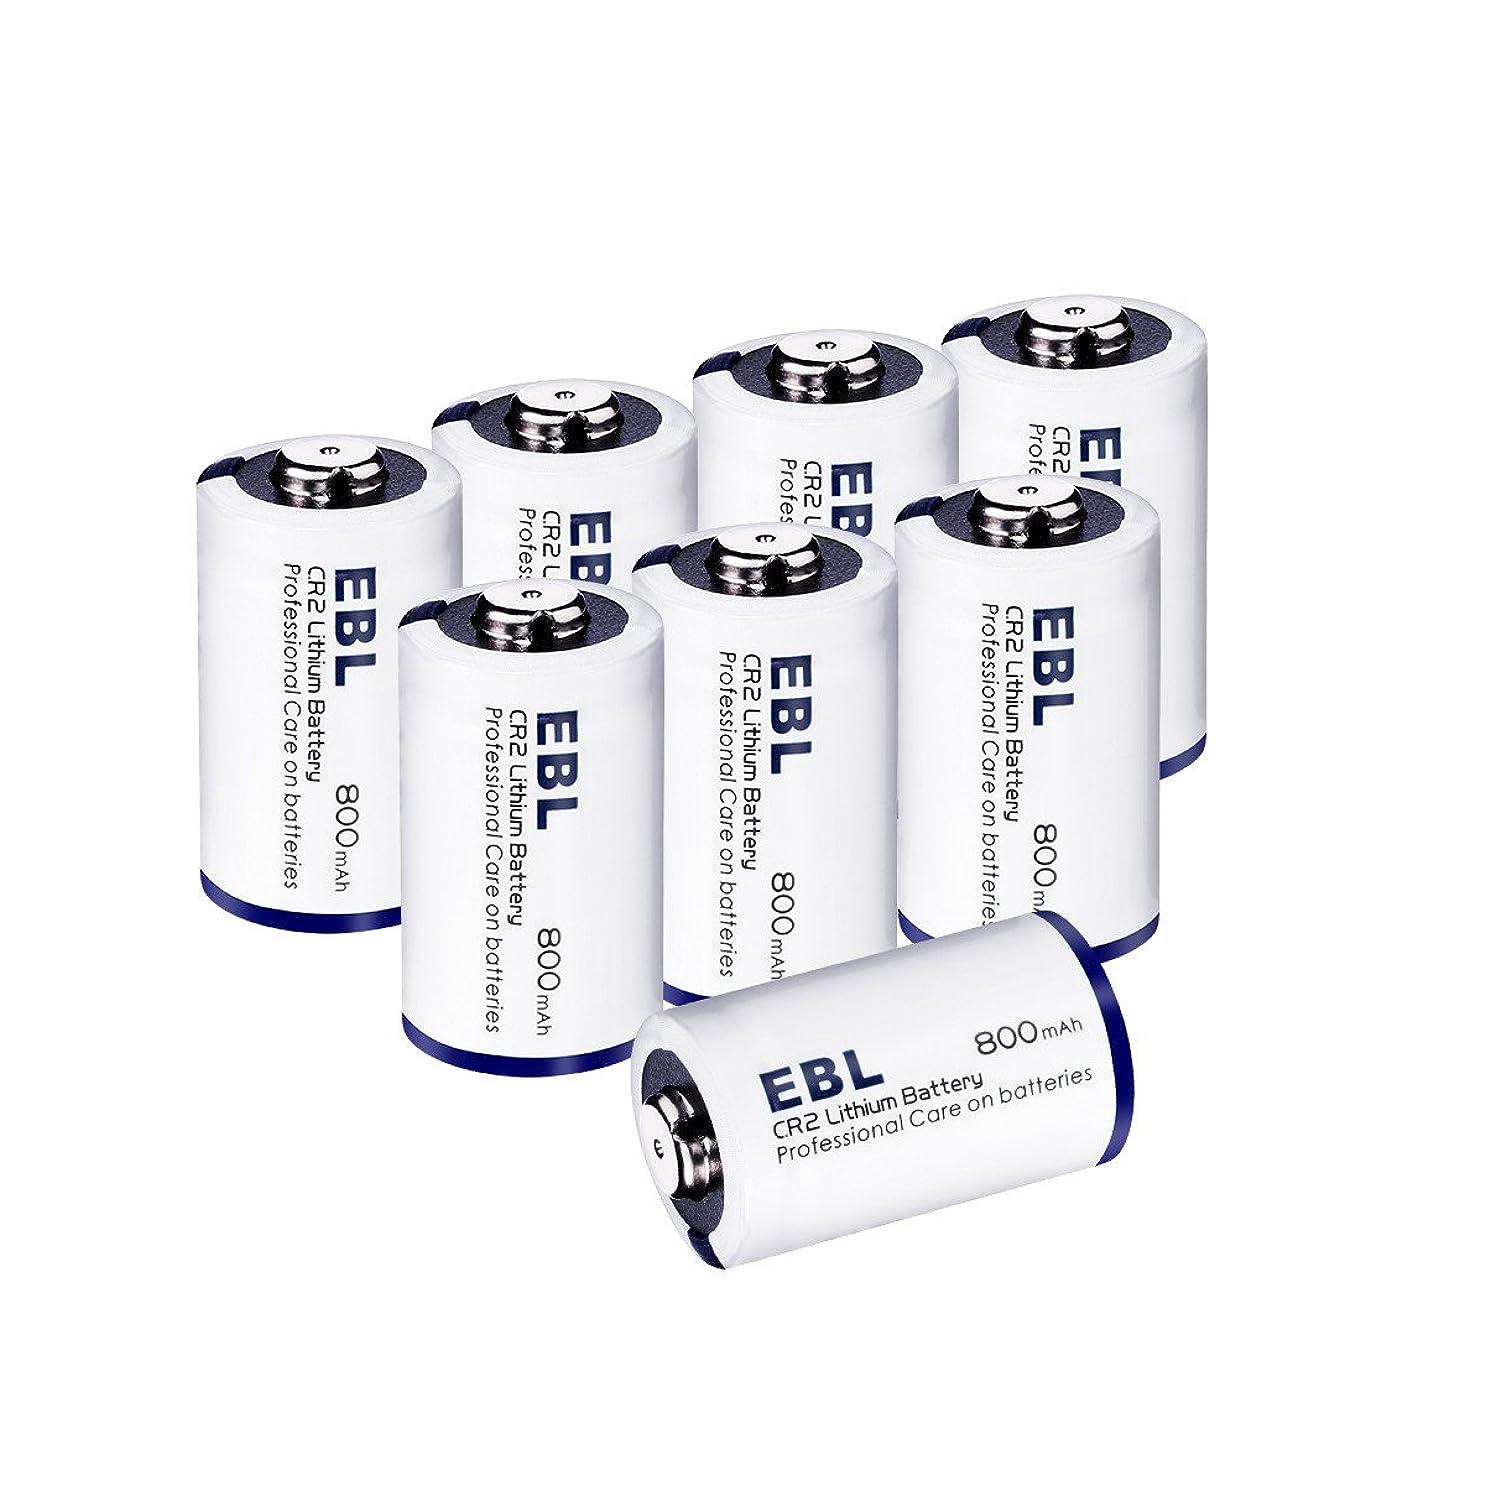 EBL CR2 リチウム電池 800mAh 8個 3V 非充電式バッテリー デジタルカメラ 懐中電灯 ベイモニター 適用 保管ケース付き